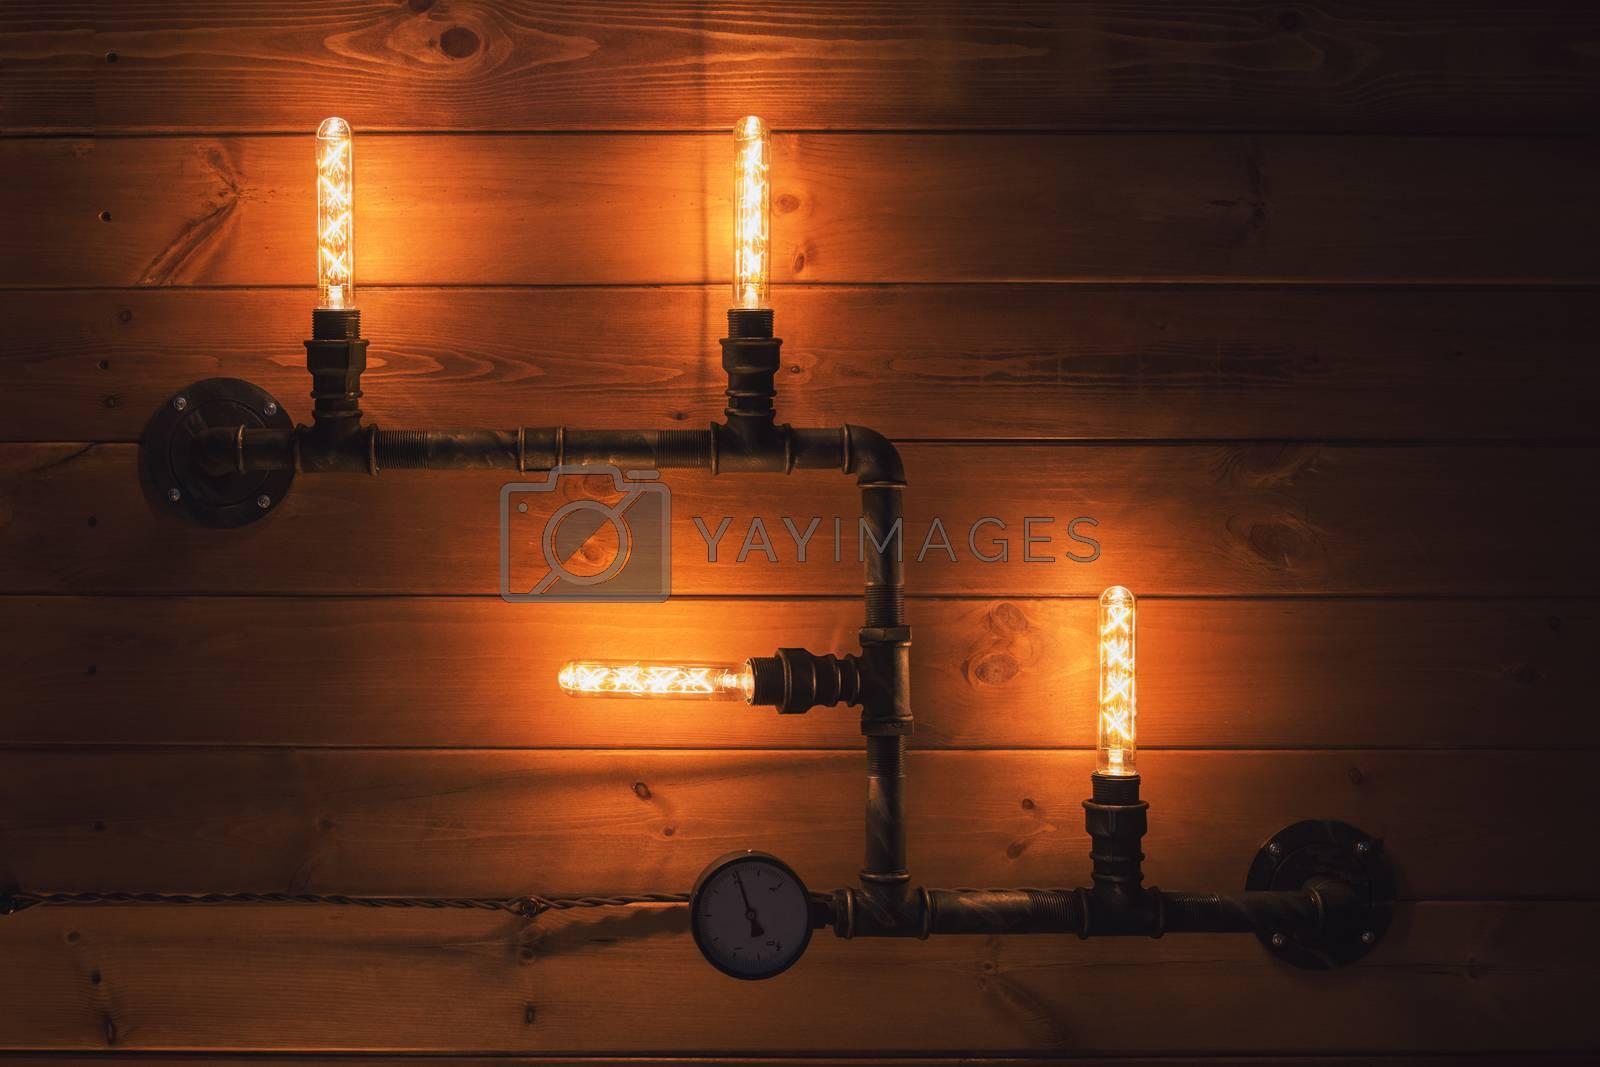 Beautiful retro edison light lamp decor background